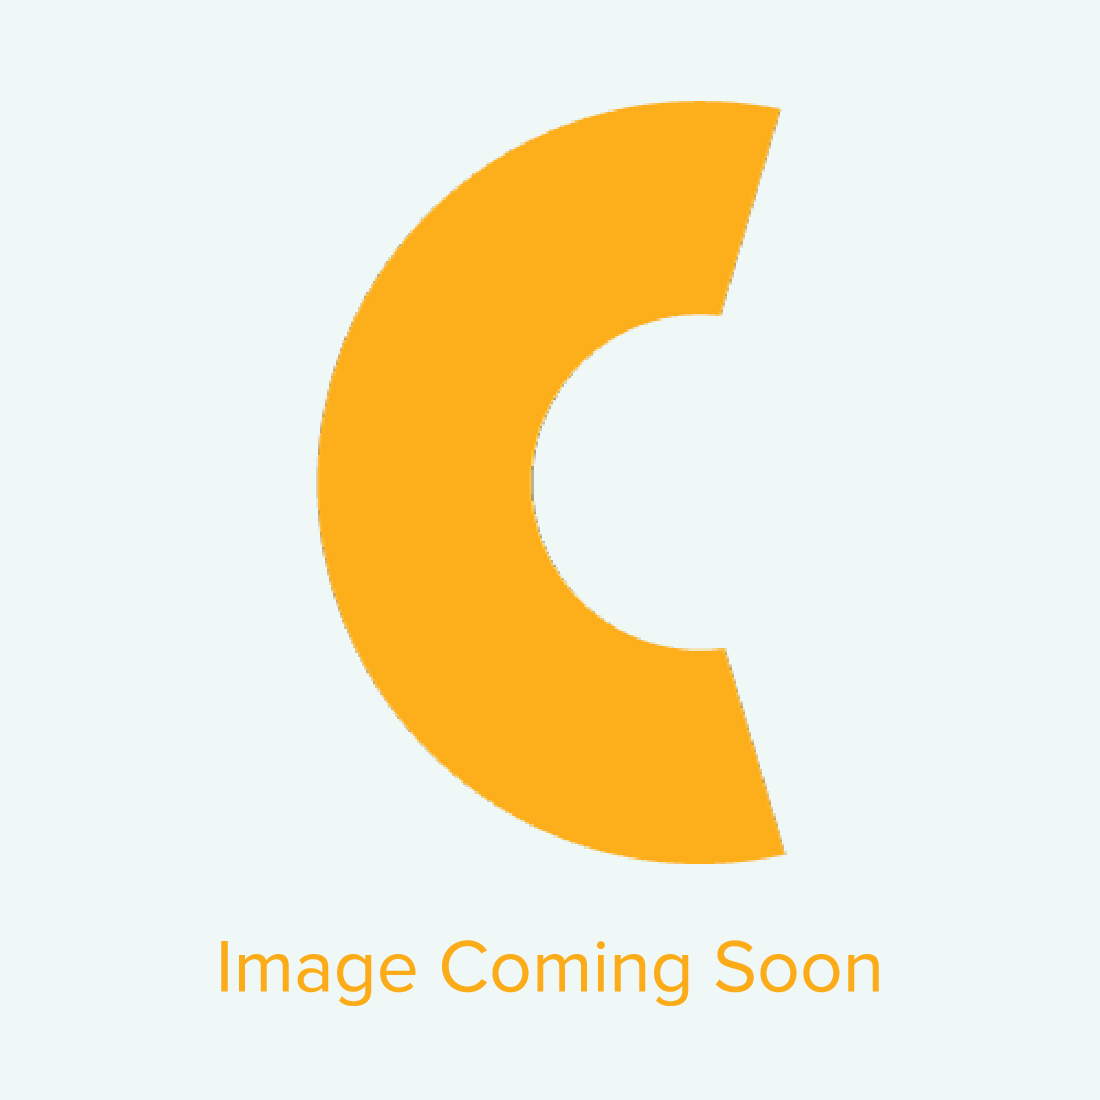 "8"" x 10"" ChromaLuxe White Sublimation MDF Photo Panel with Chamfer Black Edge - 14/case"